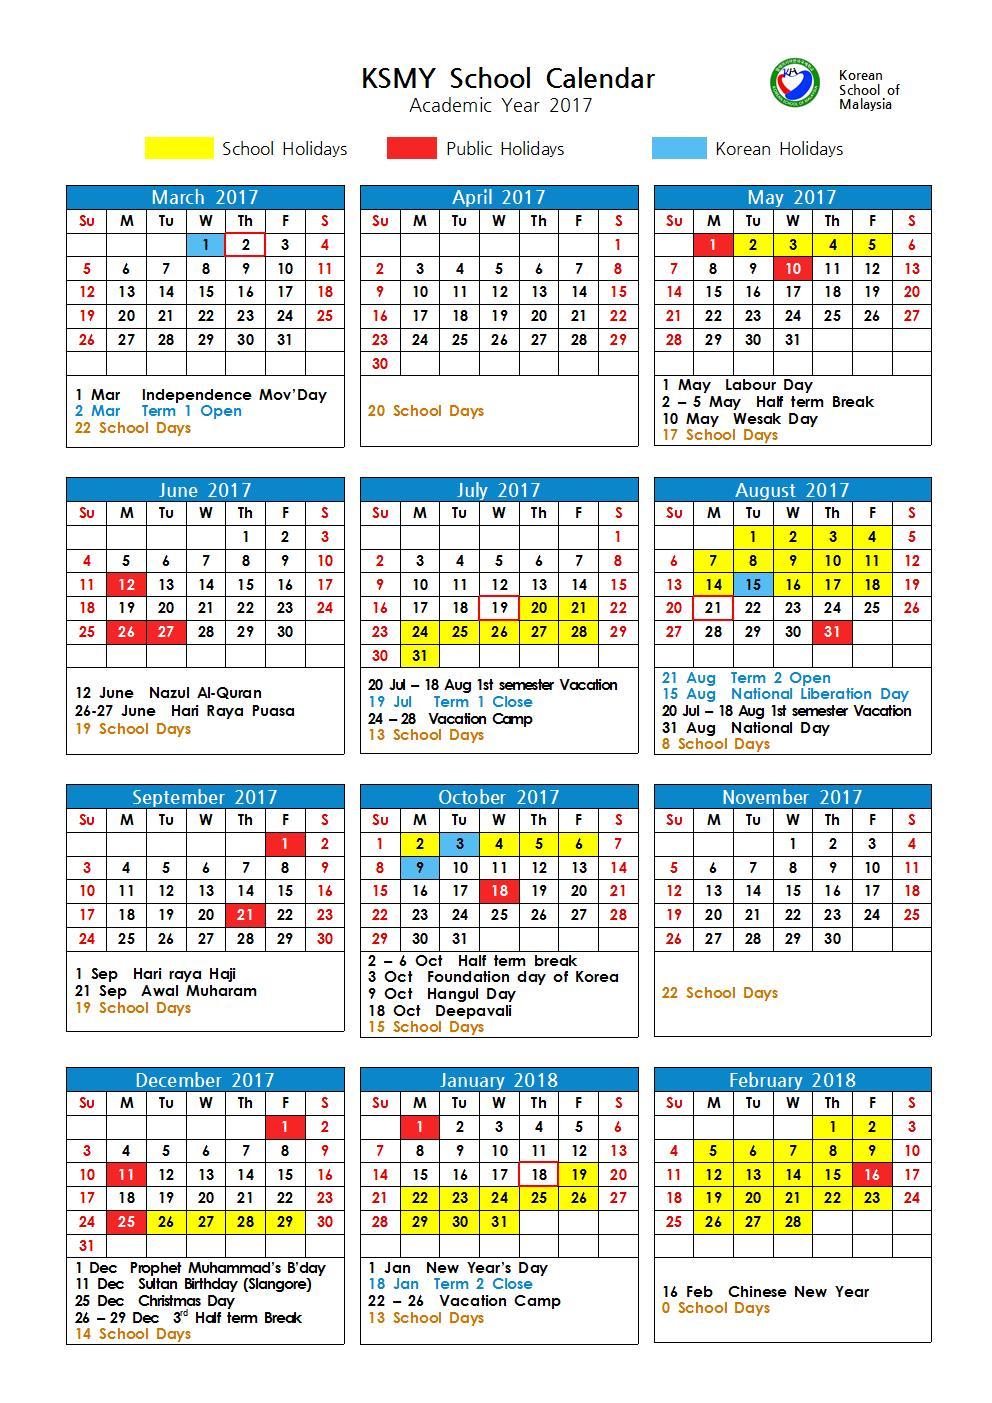 2017 KSMY School Calendar001.jpg